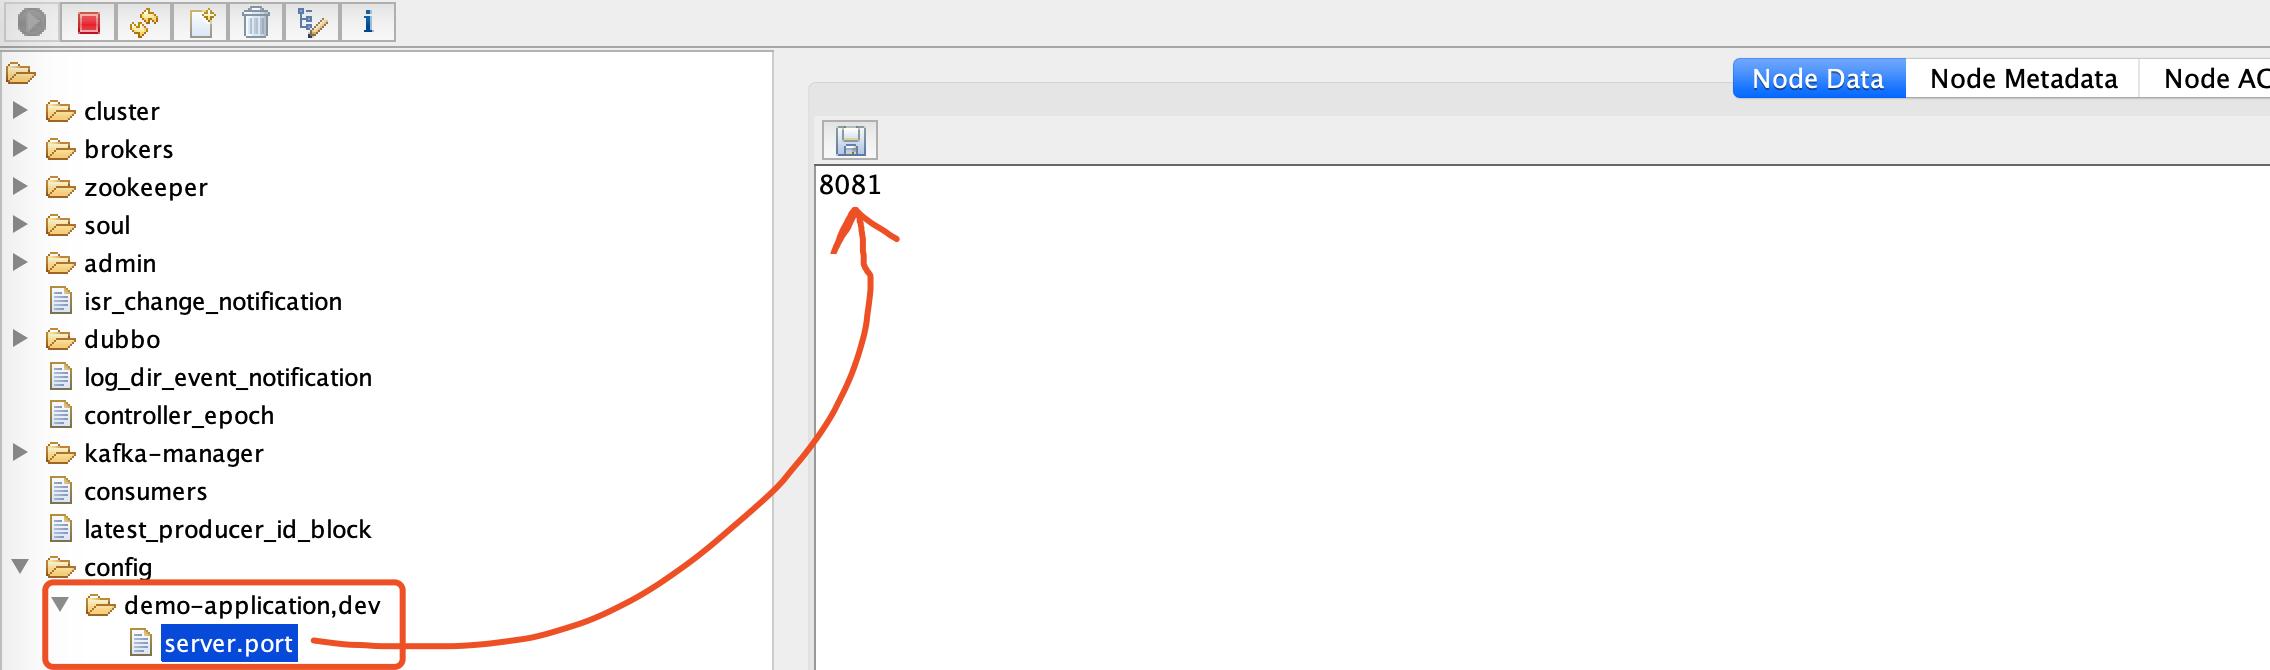 `/config/demo-application,dev` 目录